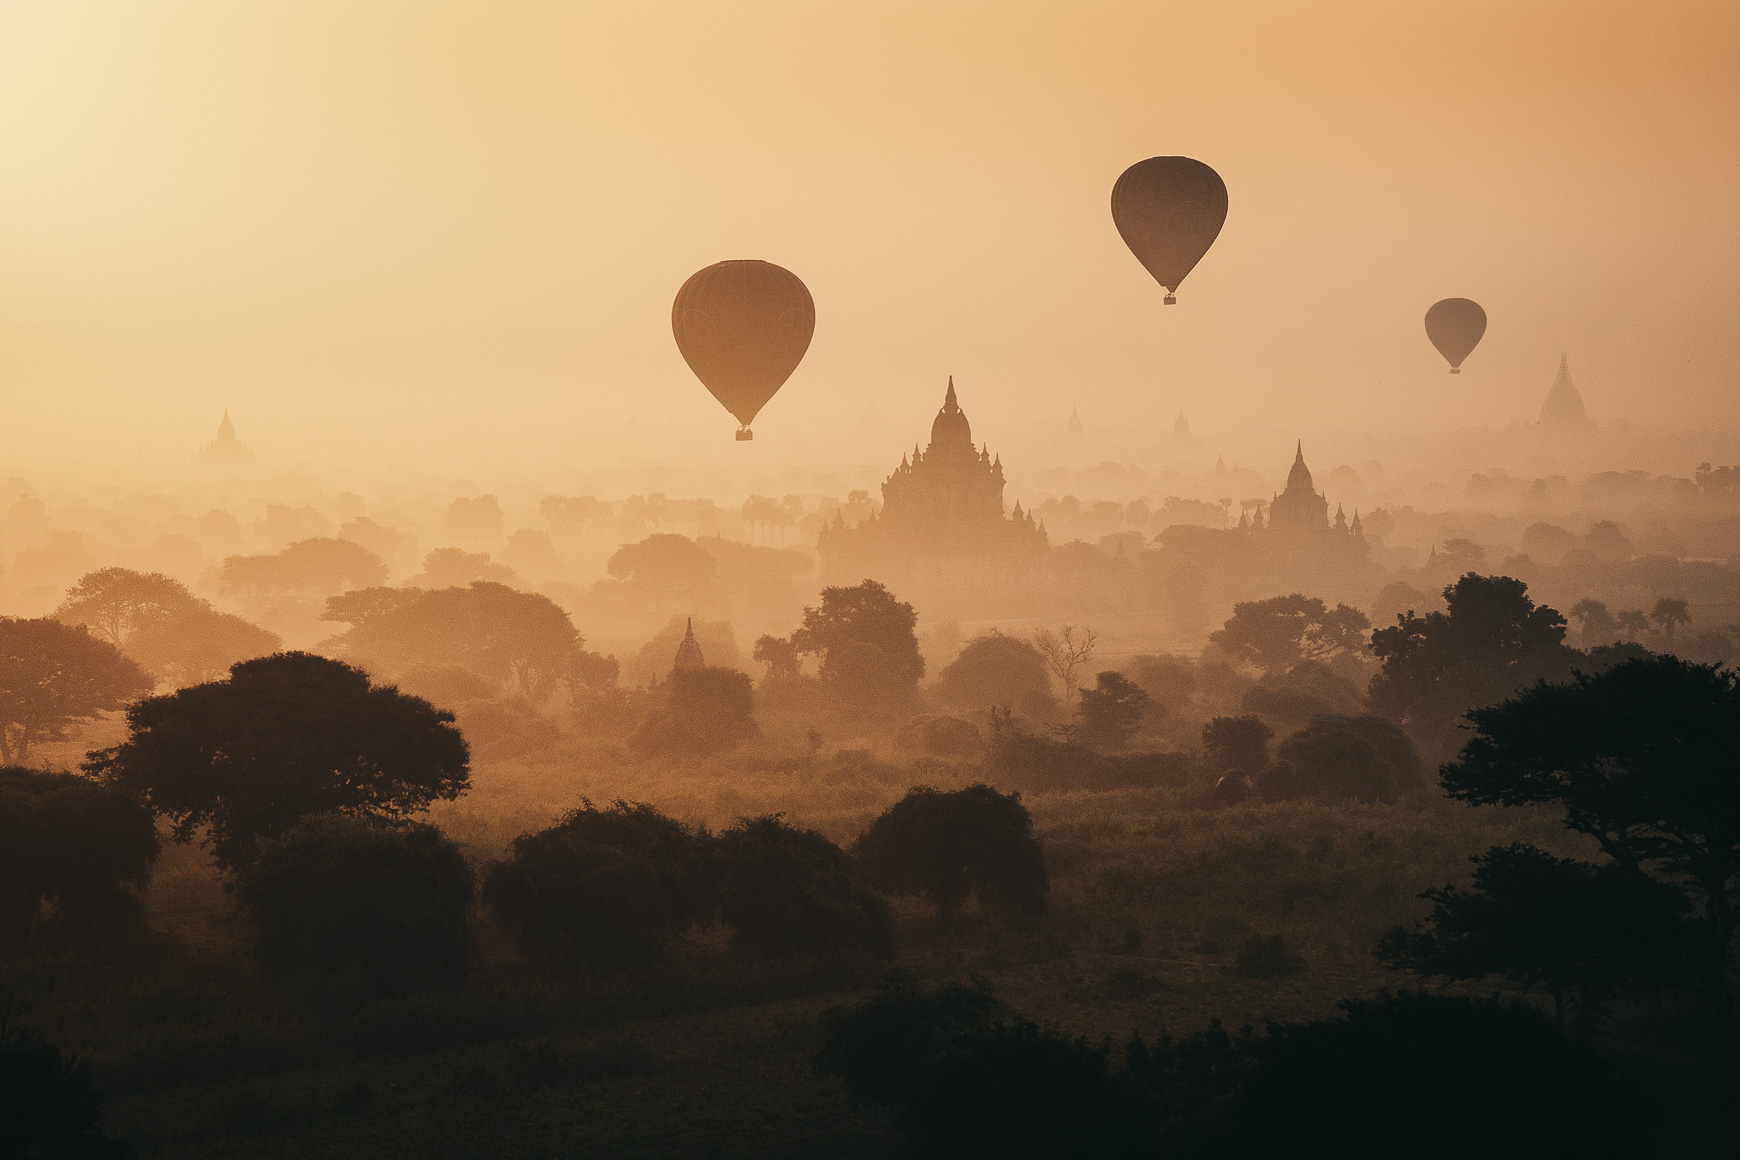 Balloons_Over_Bagan_2.jpg